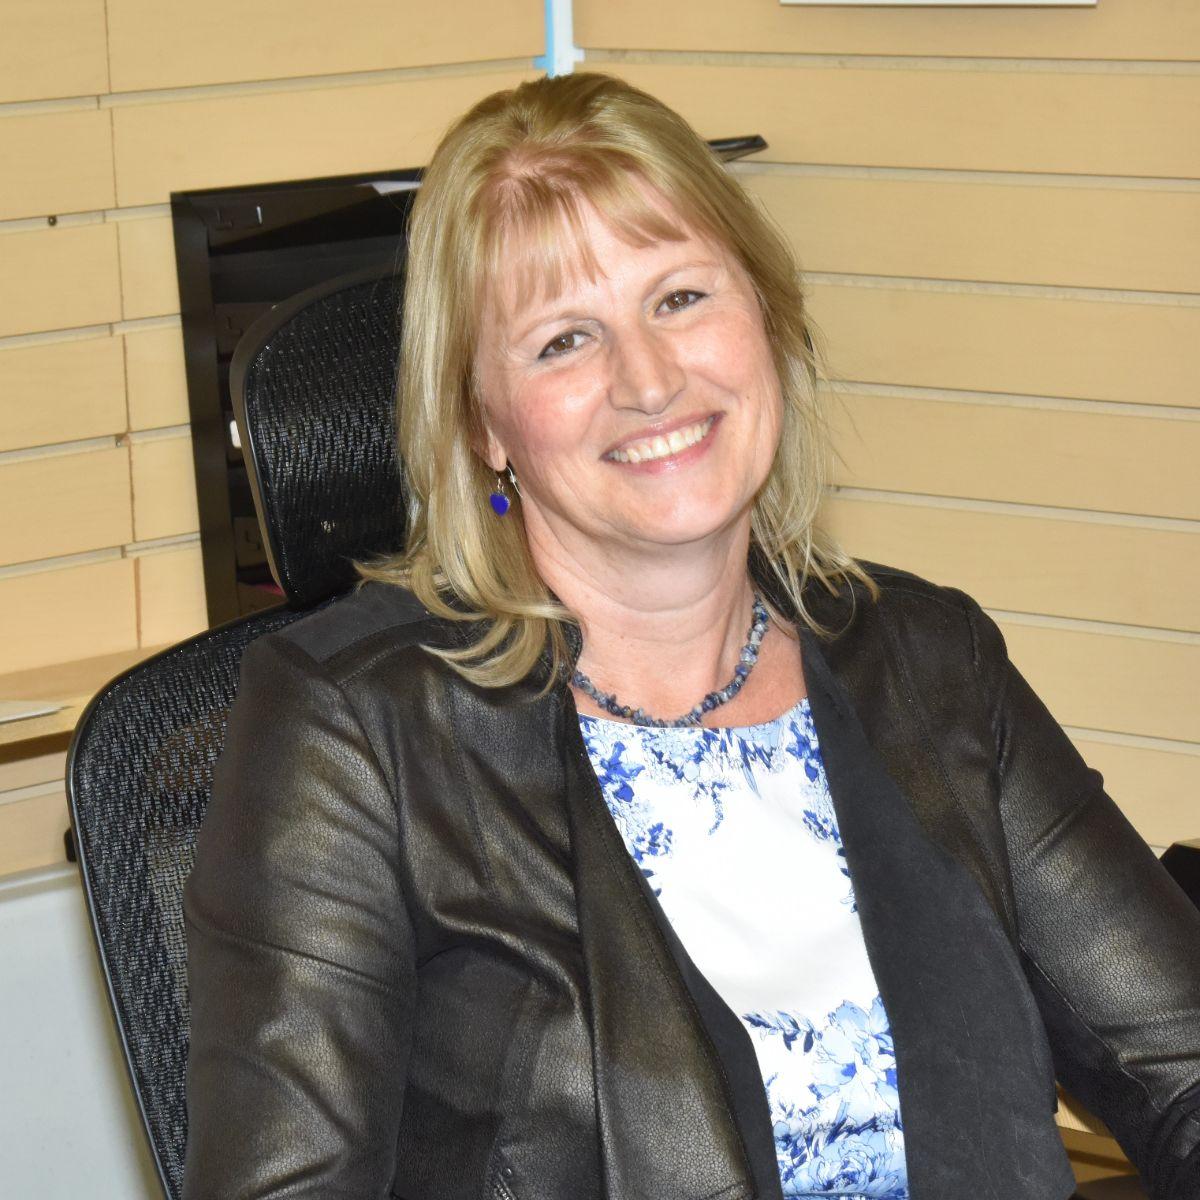 Marianne Vancaemelbeke – Directrice Générale